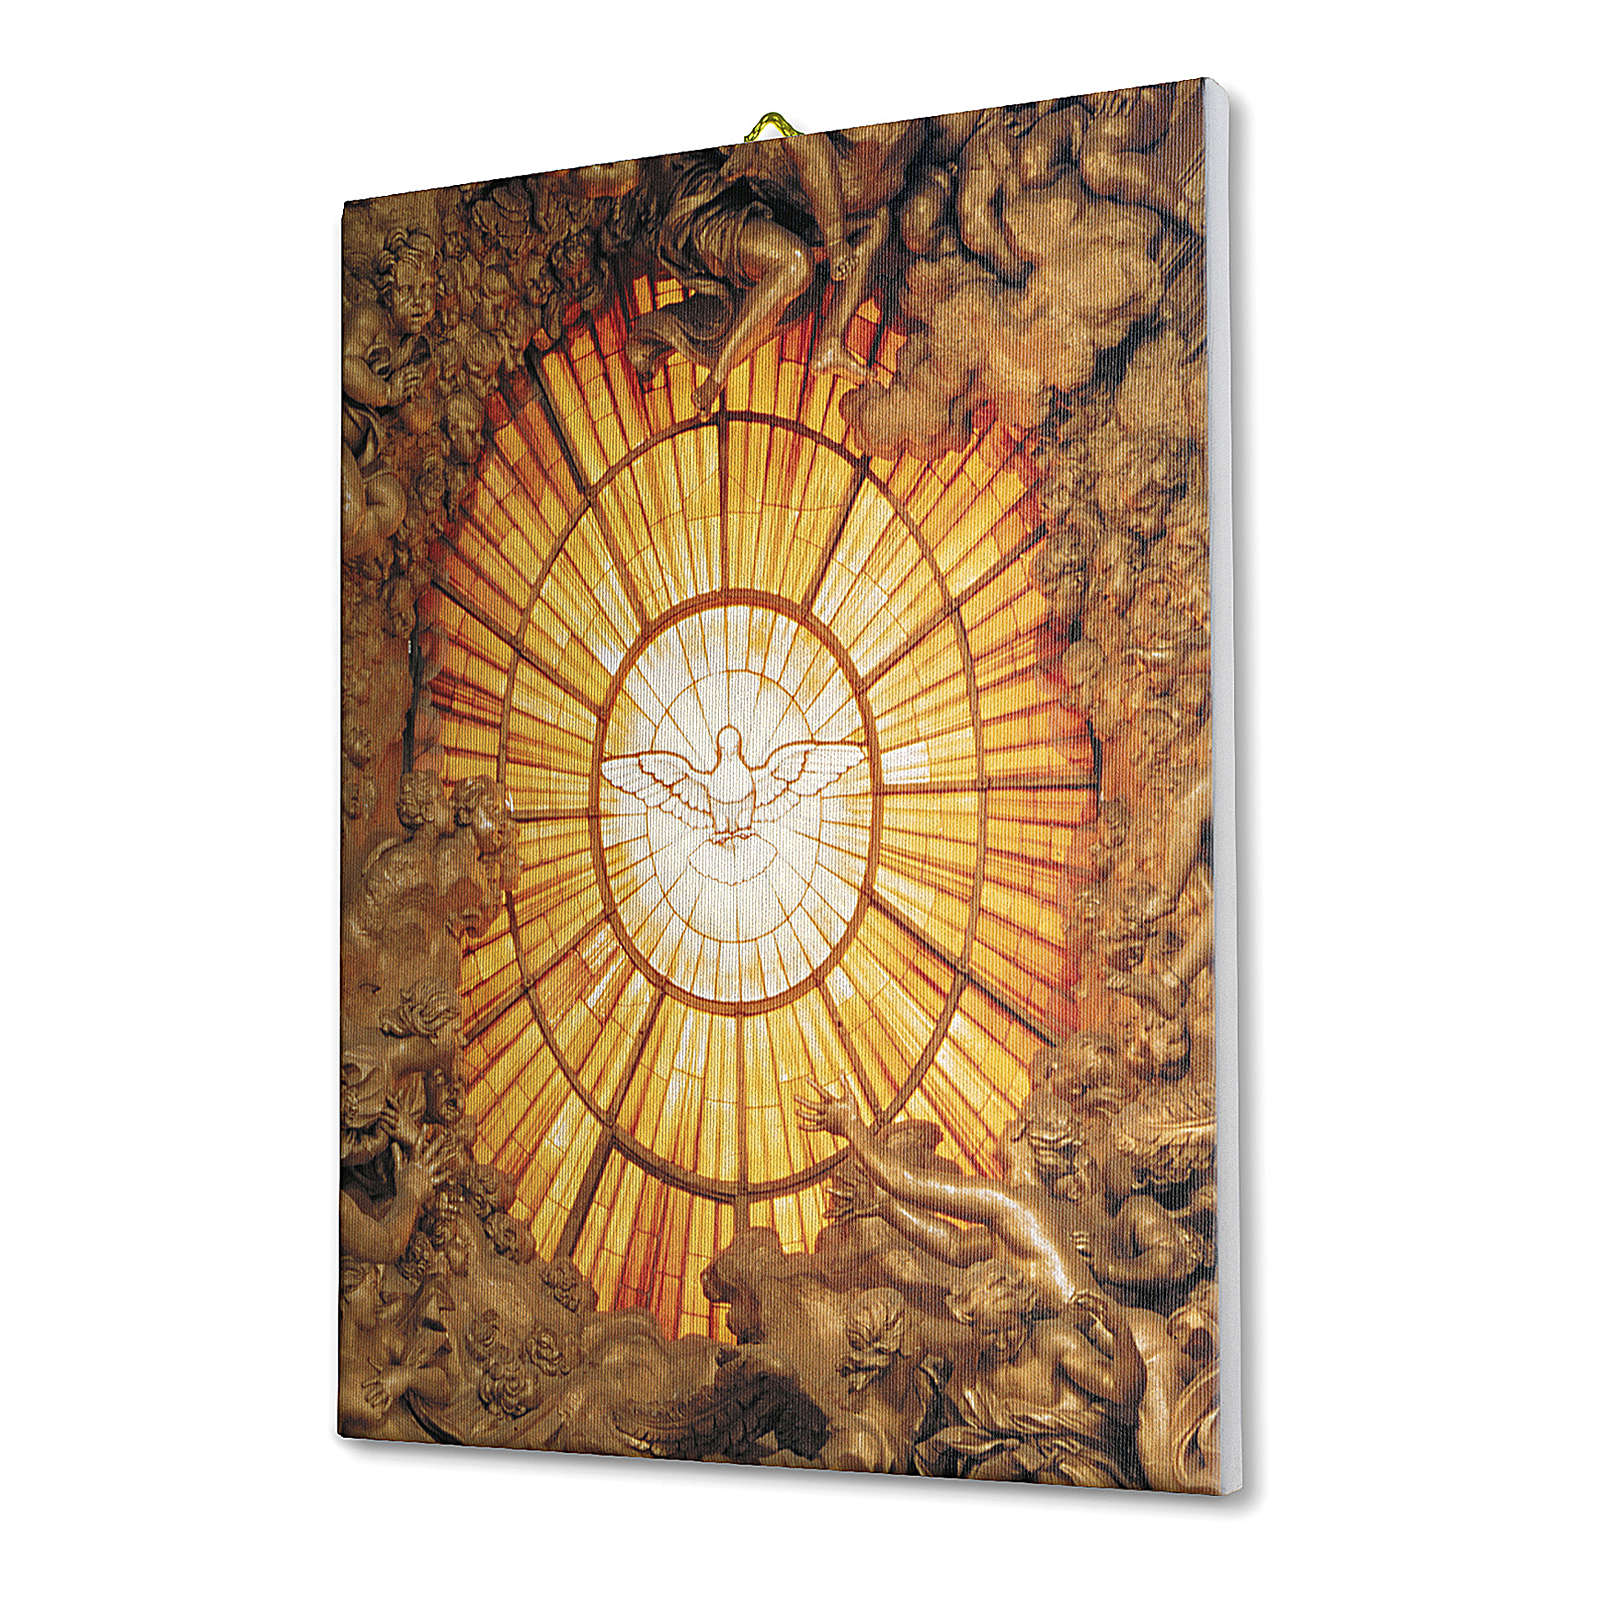 Cuadro sobre tela pictórica San Francisco de Cimabue 25x20 cm 3